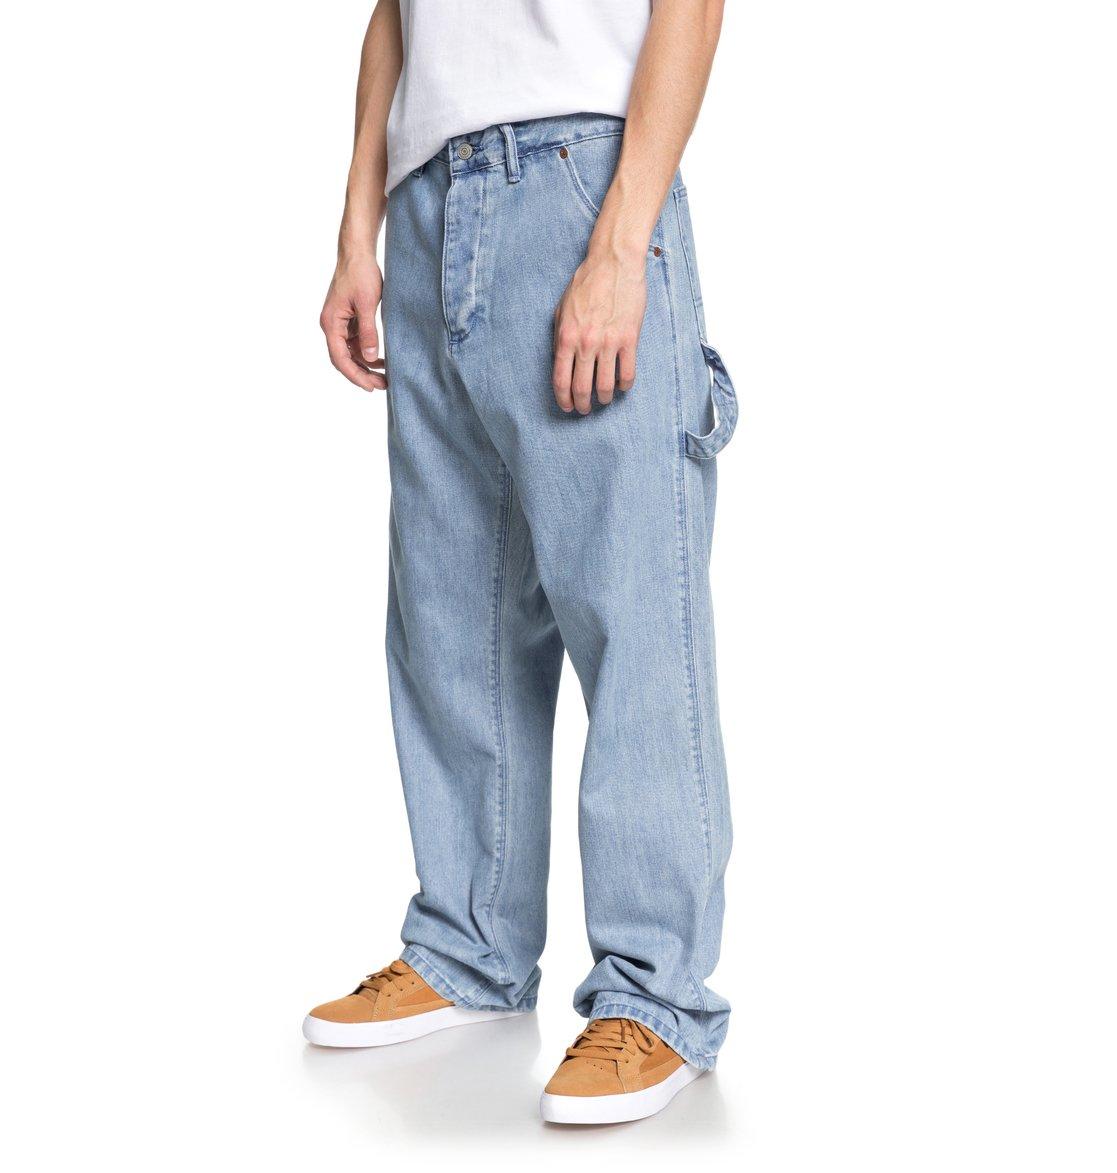 dc shoes Core - Jeans Carpenter da Uomo - Blue - DC Shoes Para Barato En Línea Barata Nuevo Lanzamiento Con Mastercard En Línea Barata PUnnpUS9